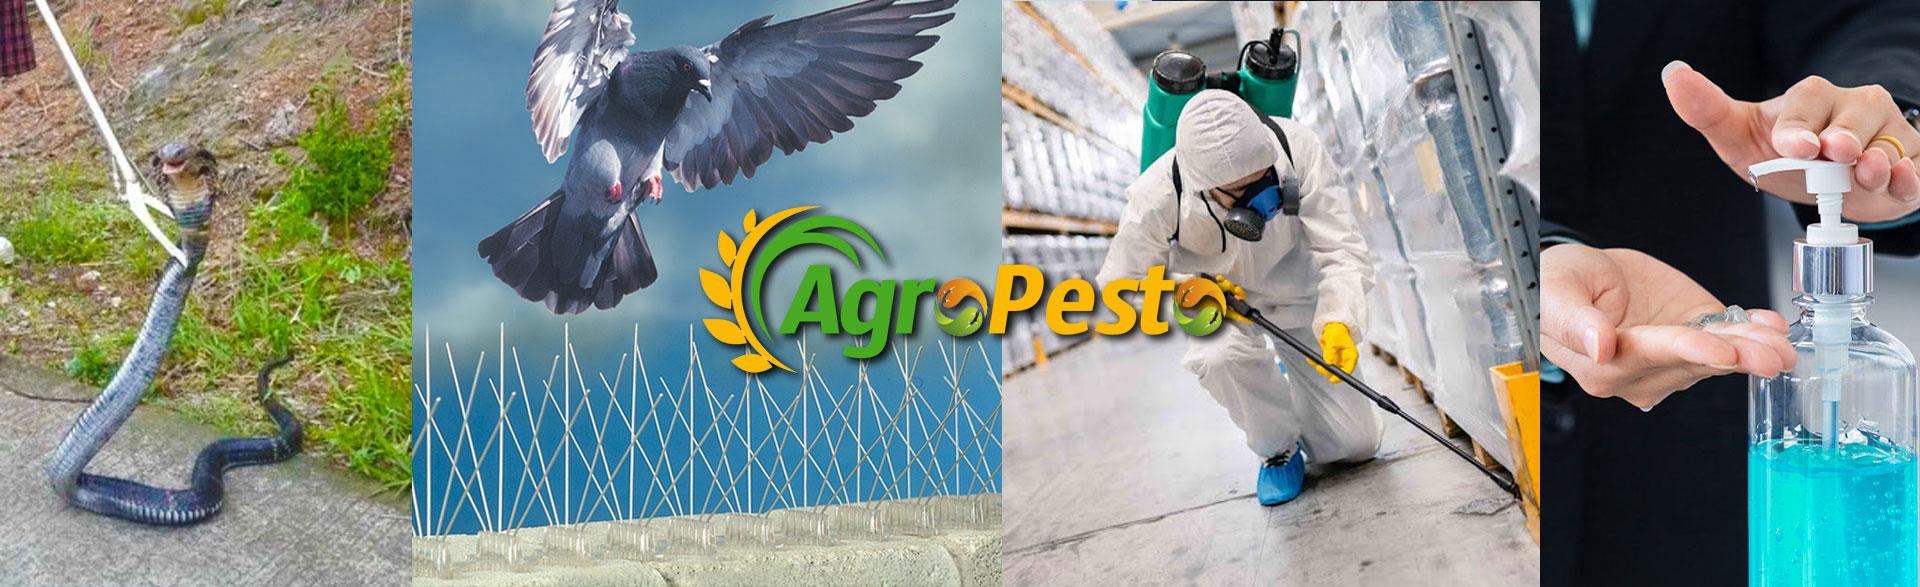 Agro Pesto Snake Bird Control